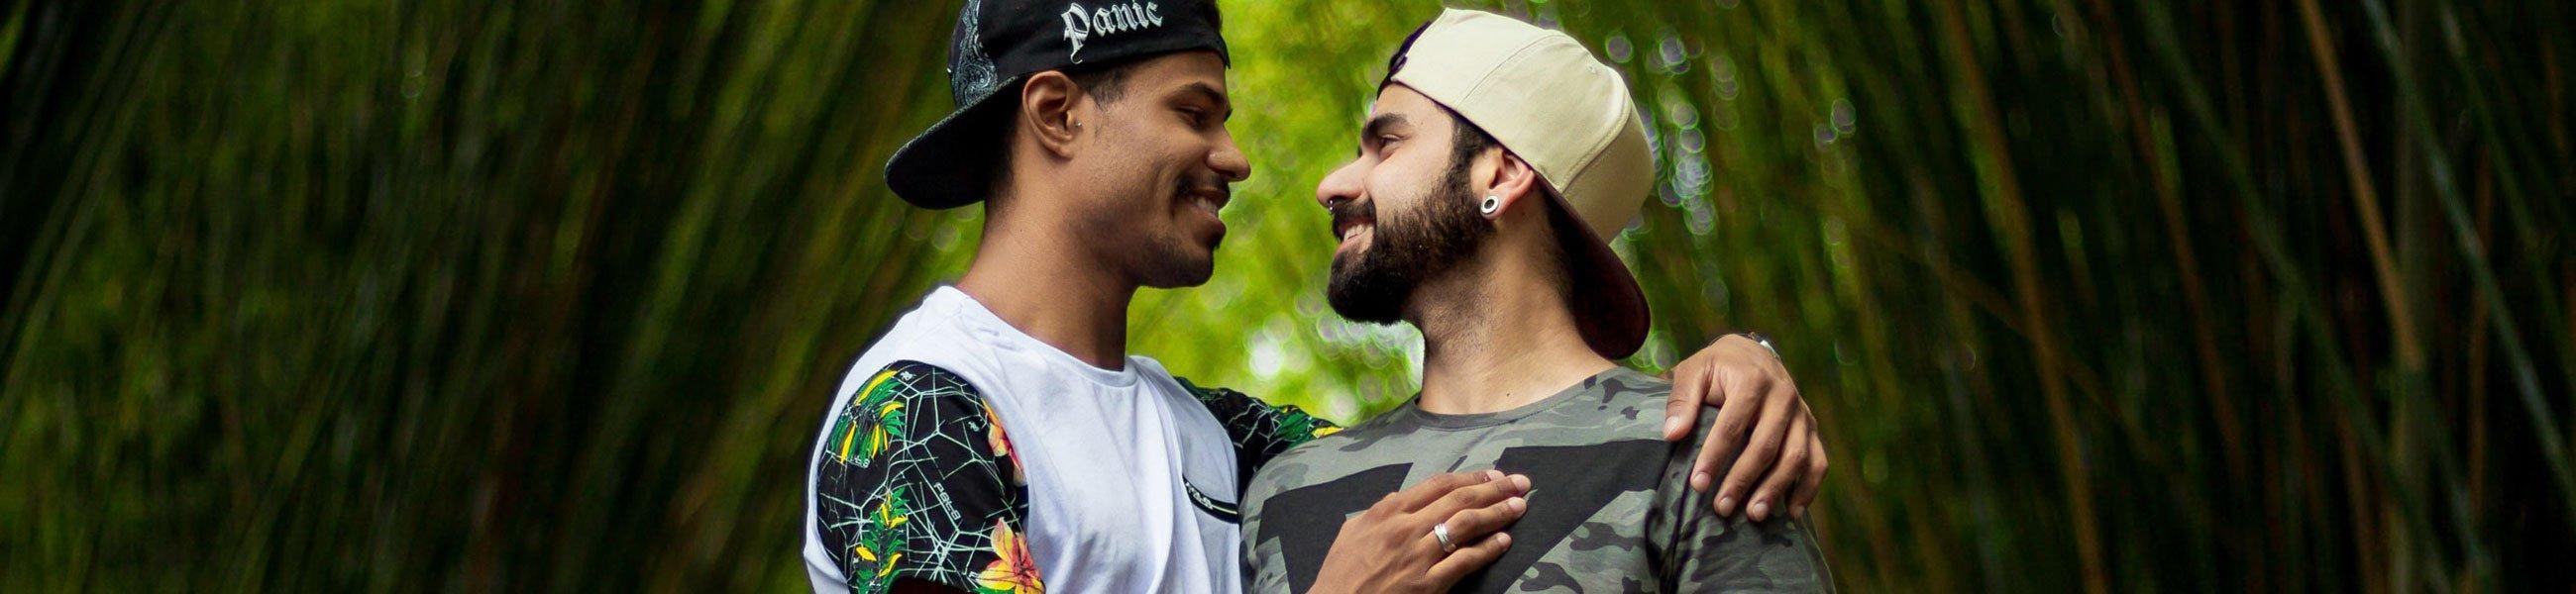 LGBT-couple-hug-cropped